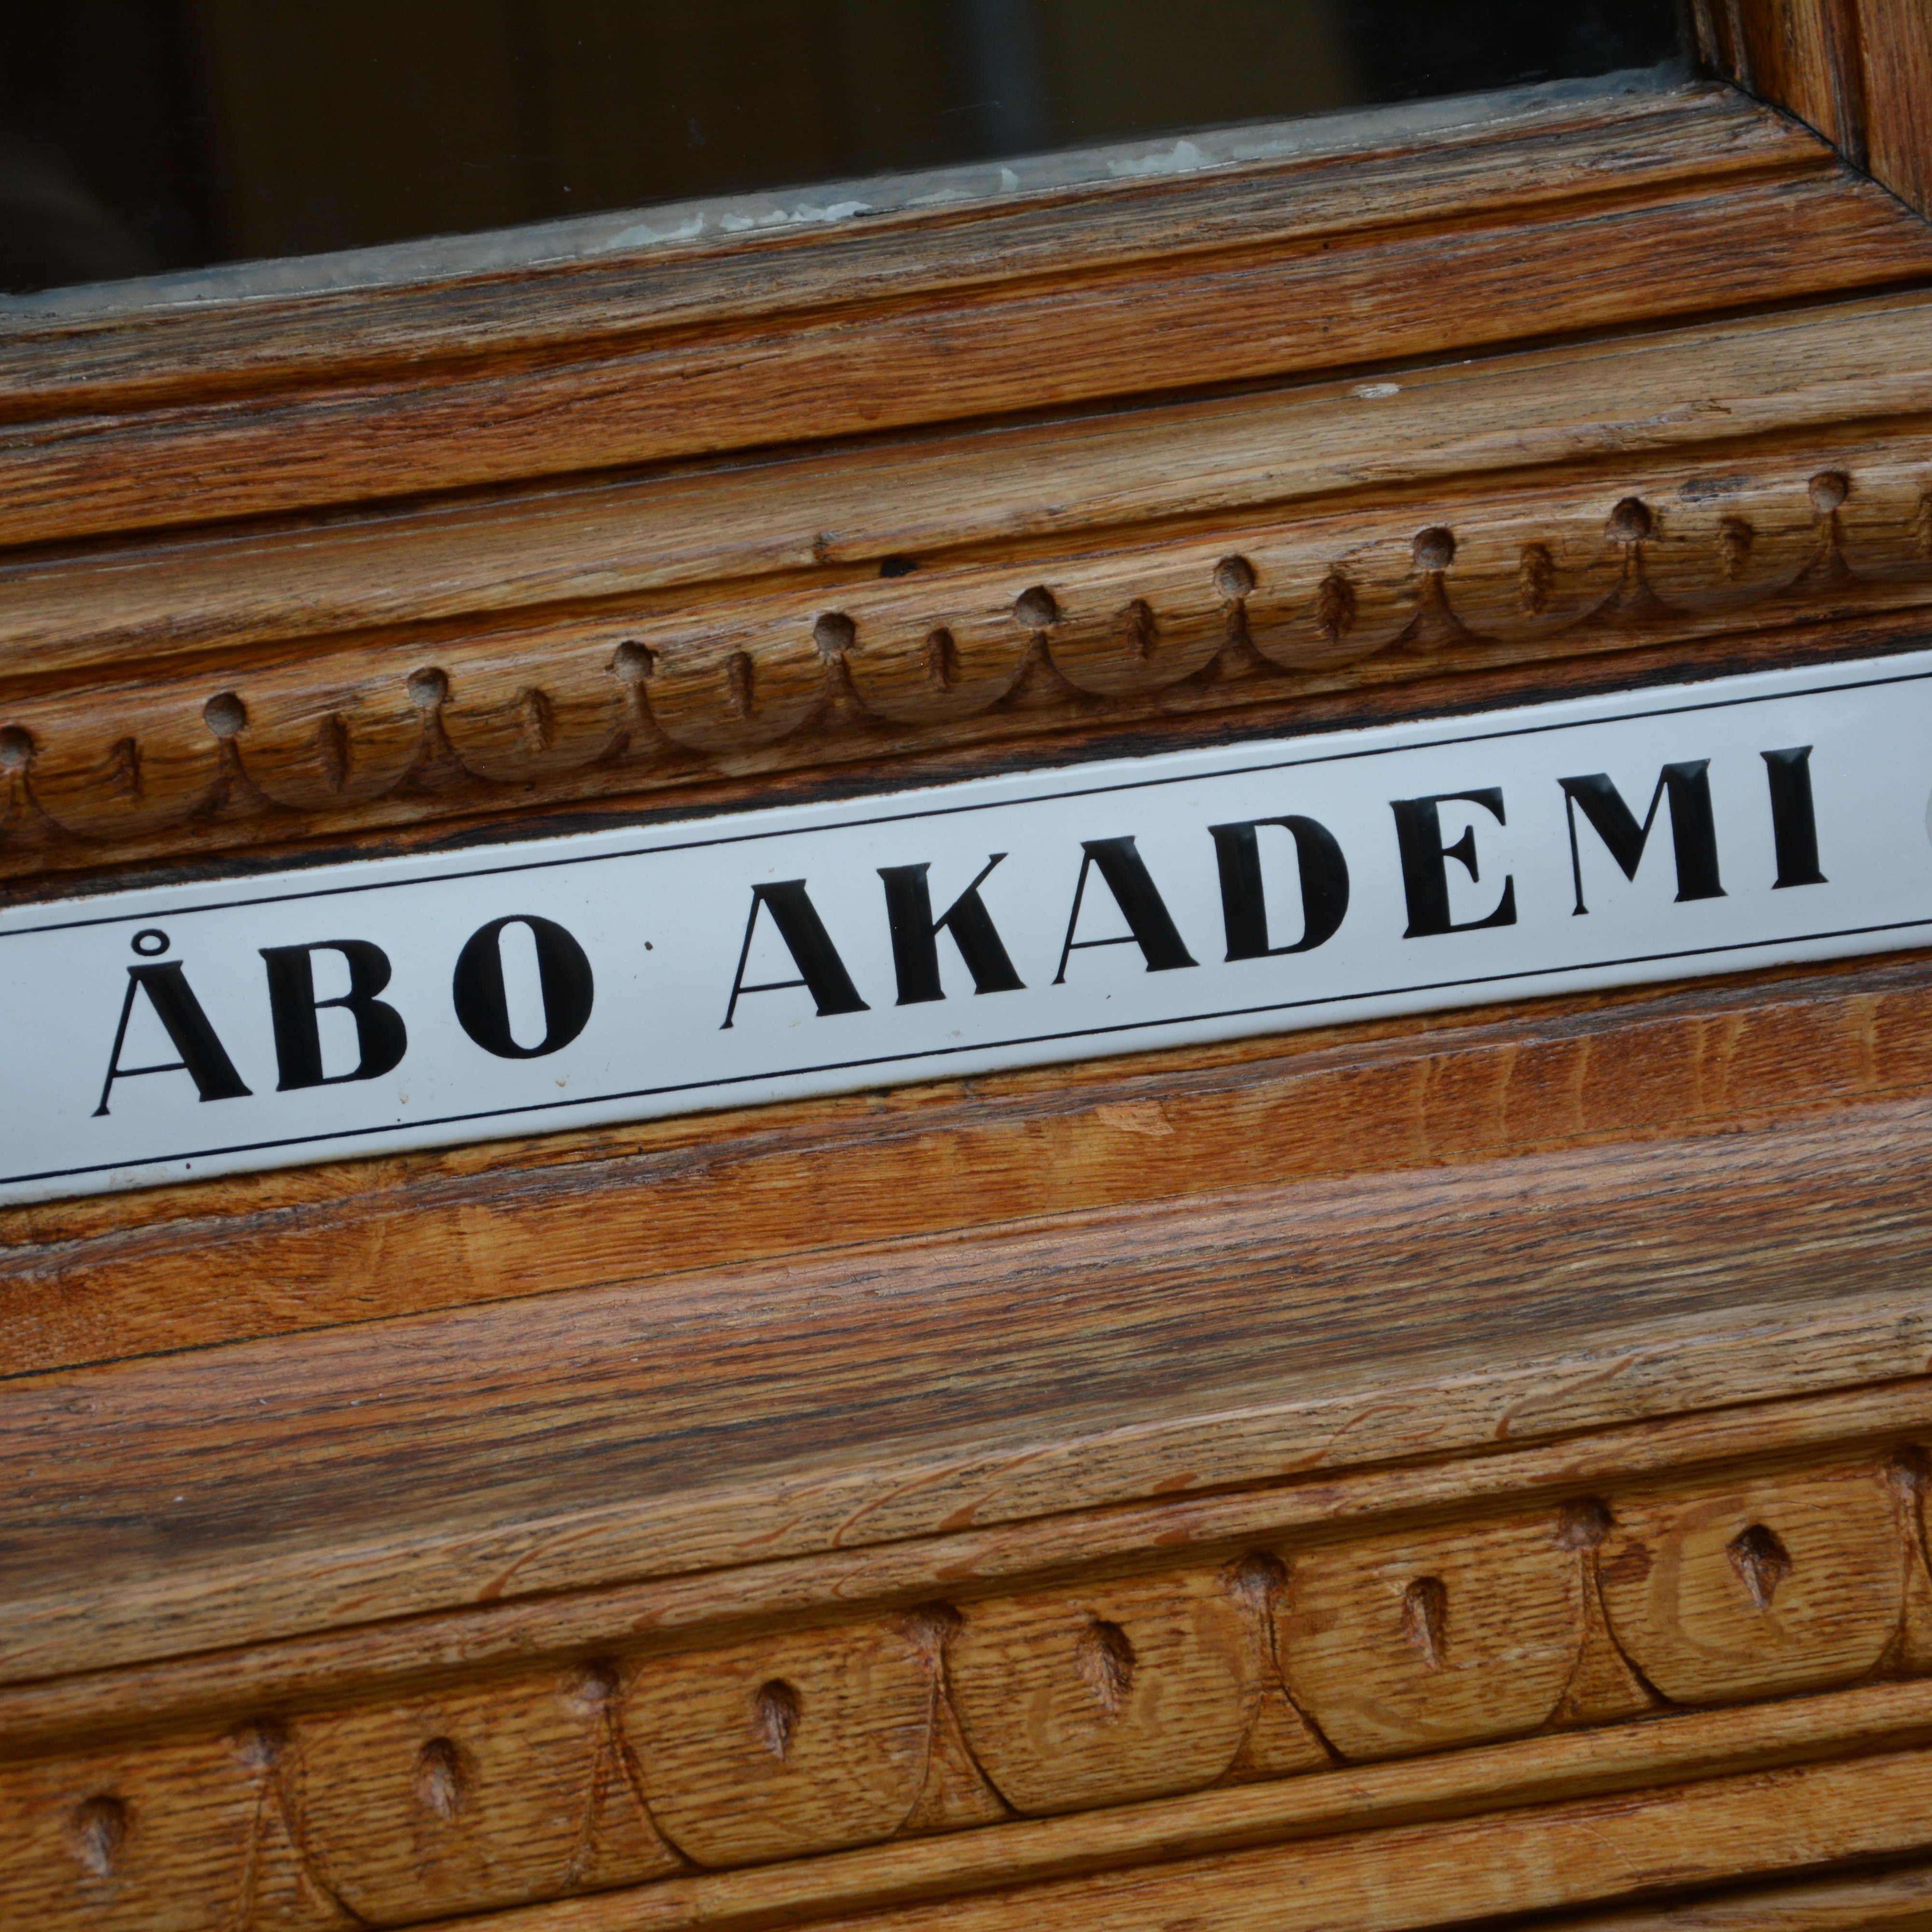 Åbo Akademin vanha, emaloitu kyltti tammiovessa.